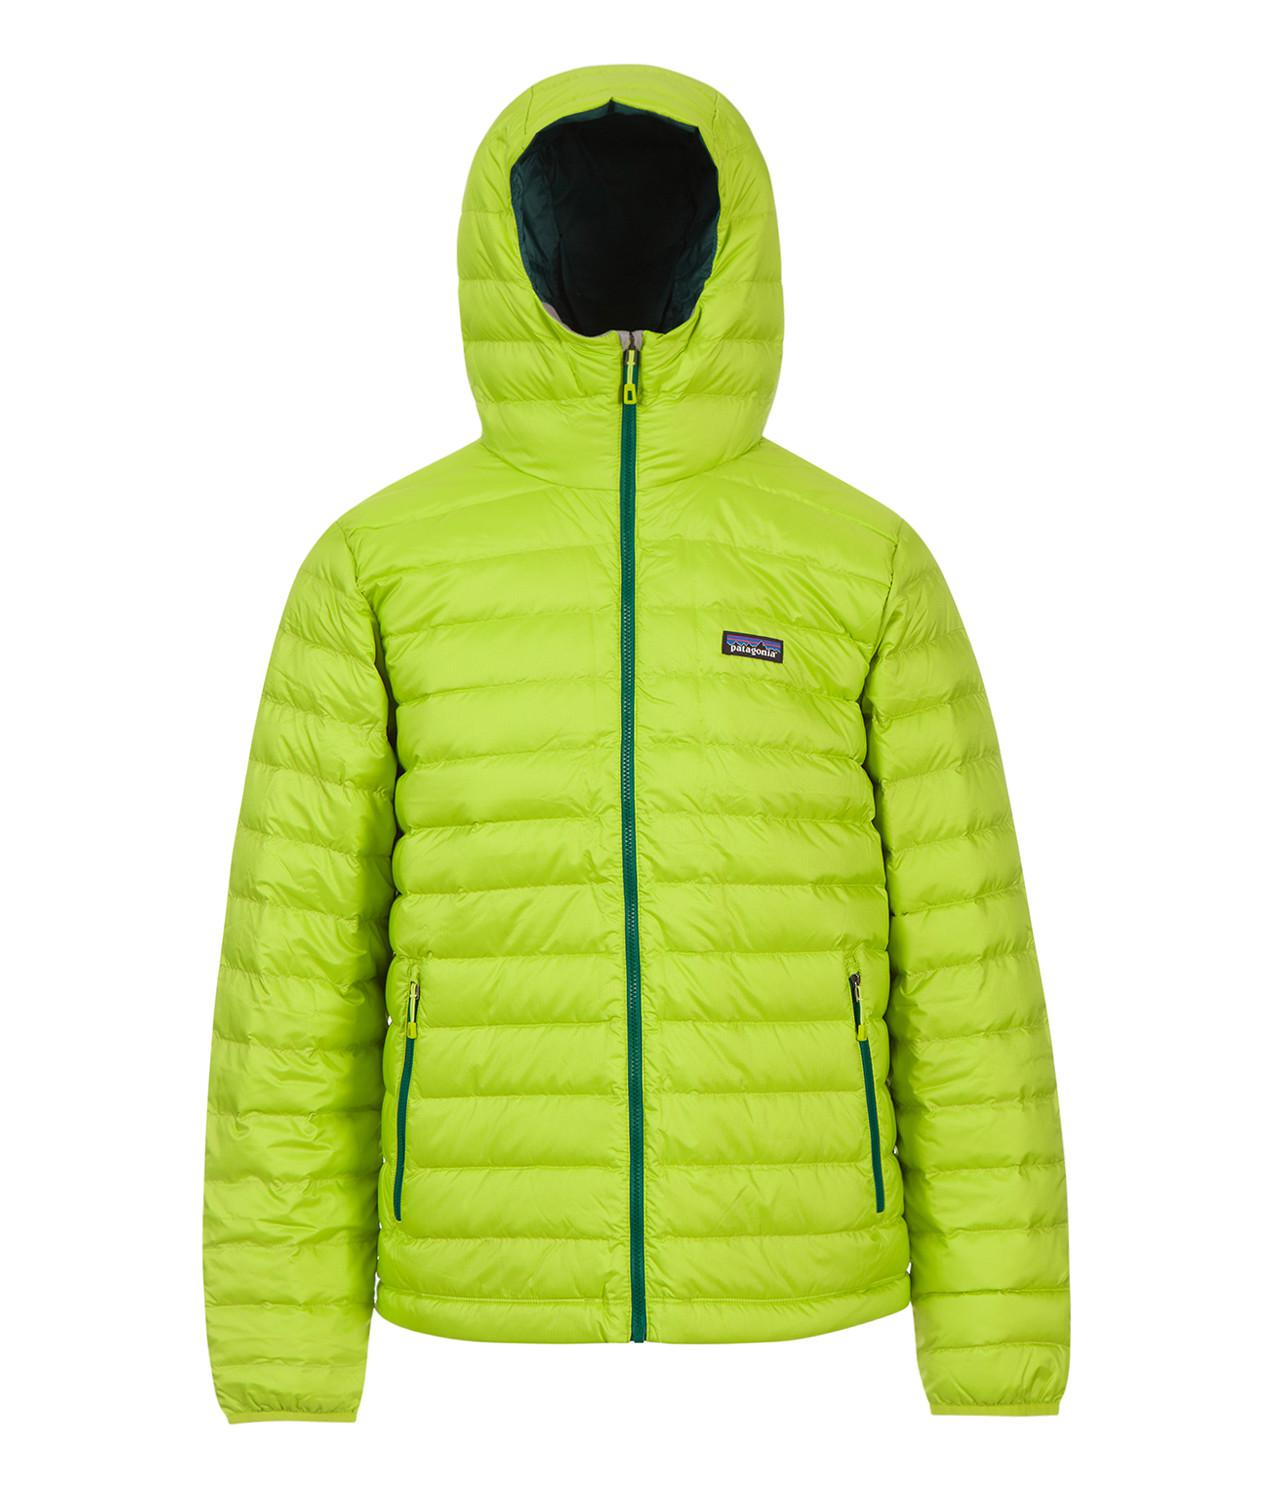 Lyst Patagonia Mens Down Sweater Hoody In Green For Men